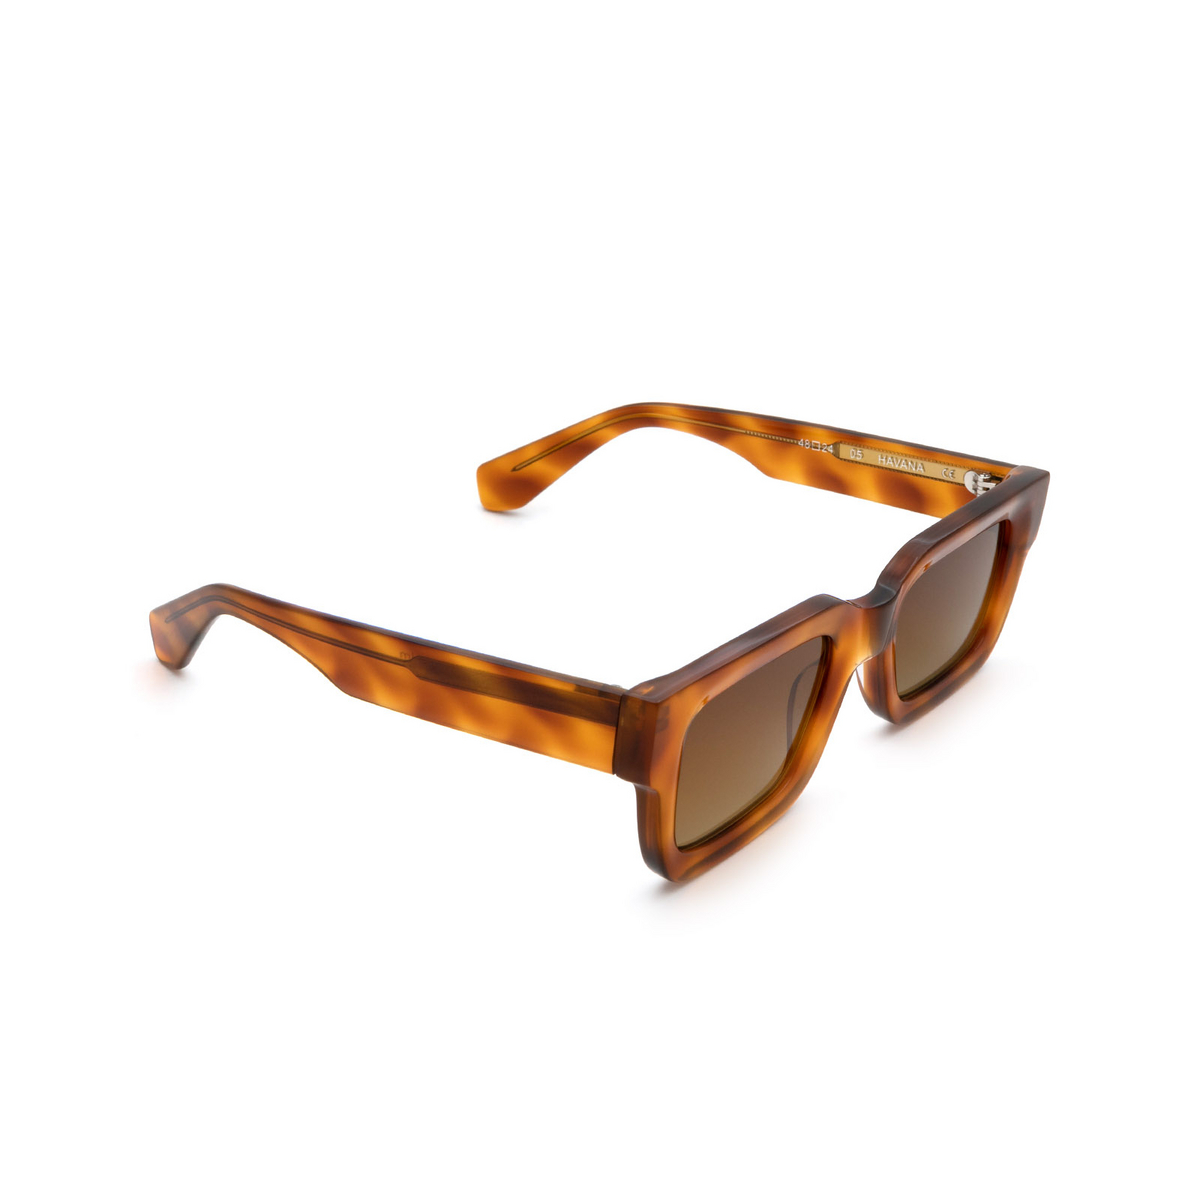 Chimi® Rectangle Sunglasses: 05 color Havana - three-quarters view.